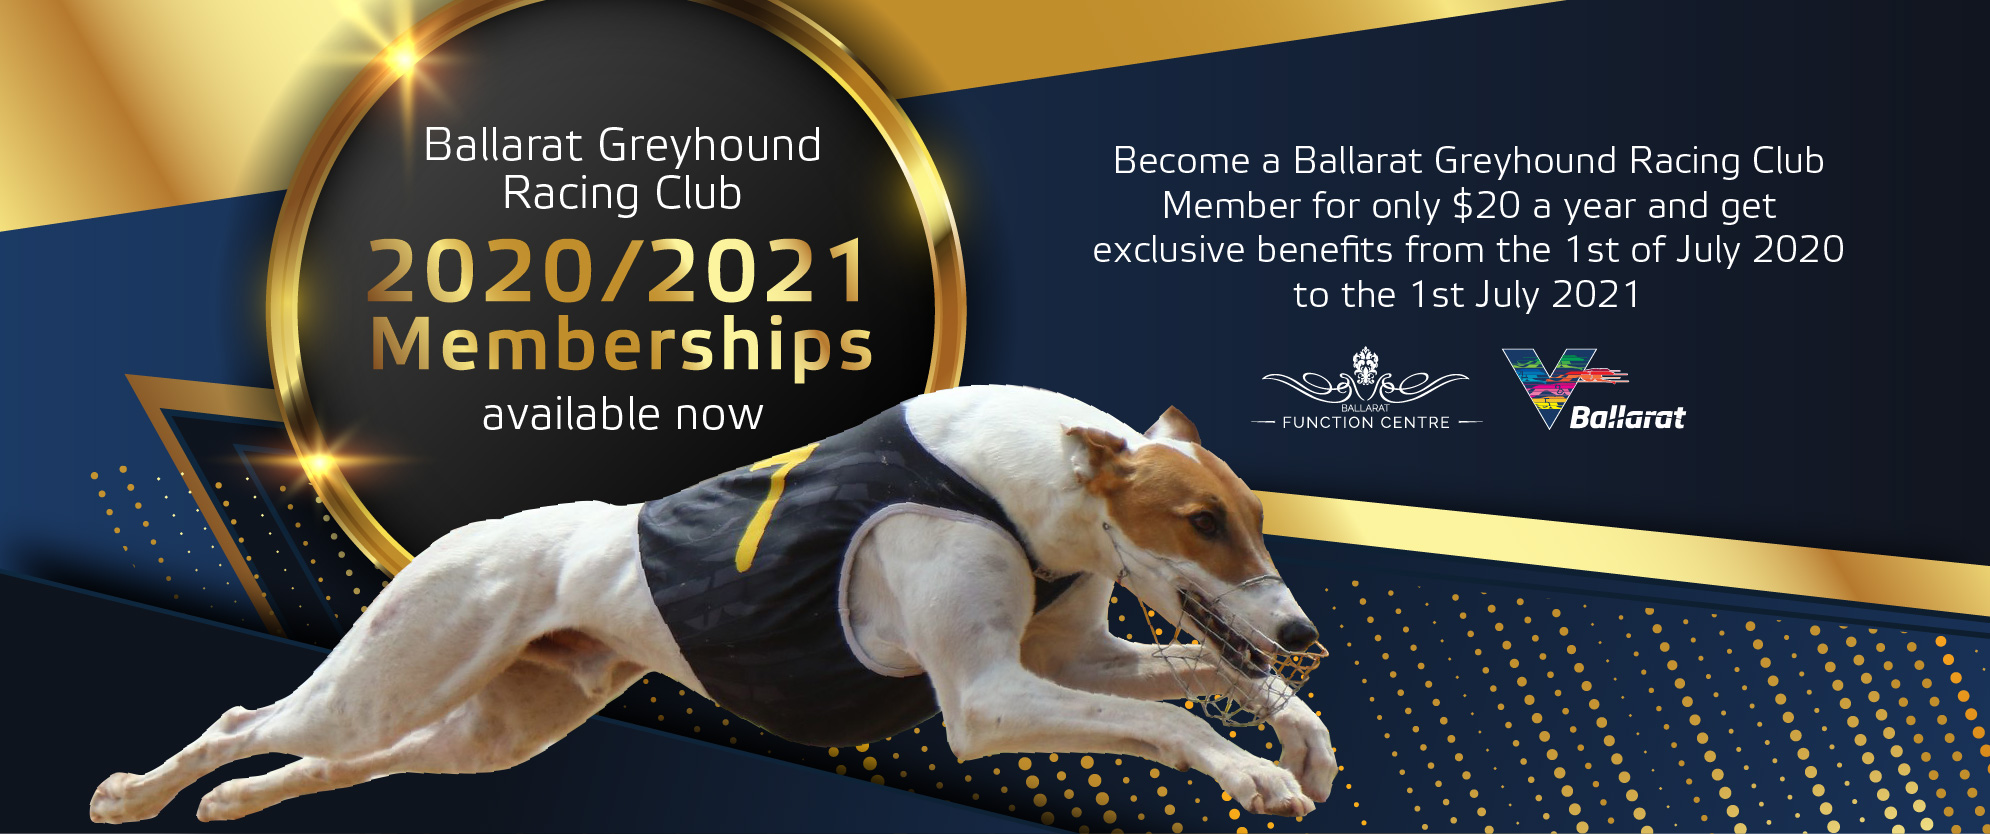 GRV_Ballarat_Membership 2020-2021_Digital_GRV Slider 955x400